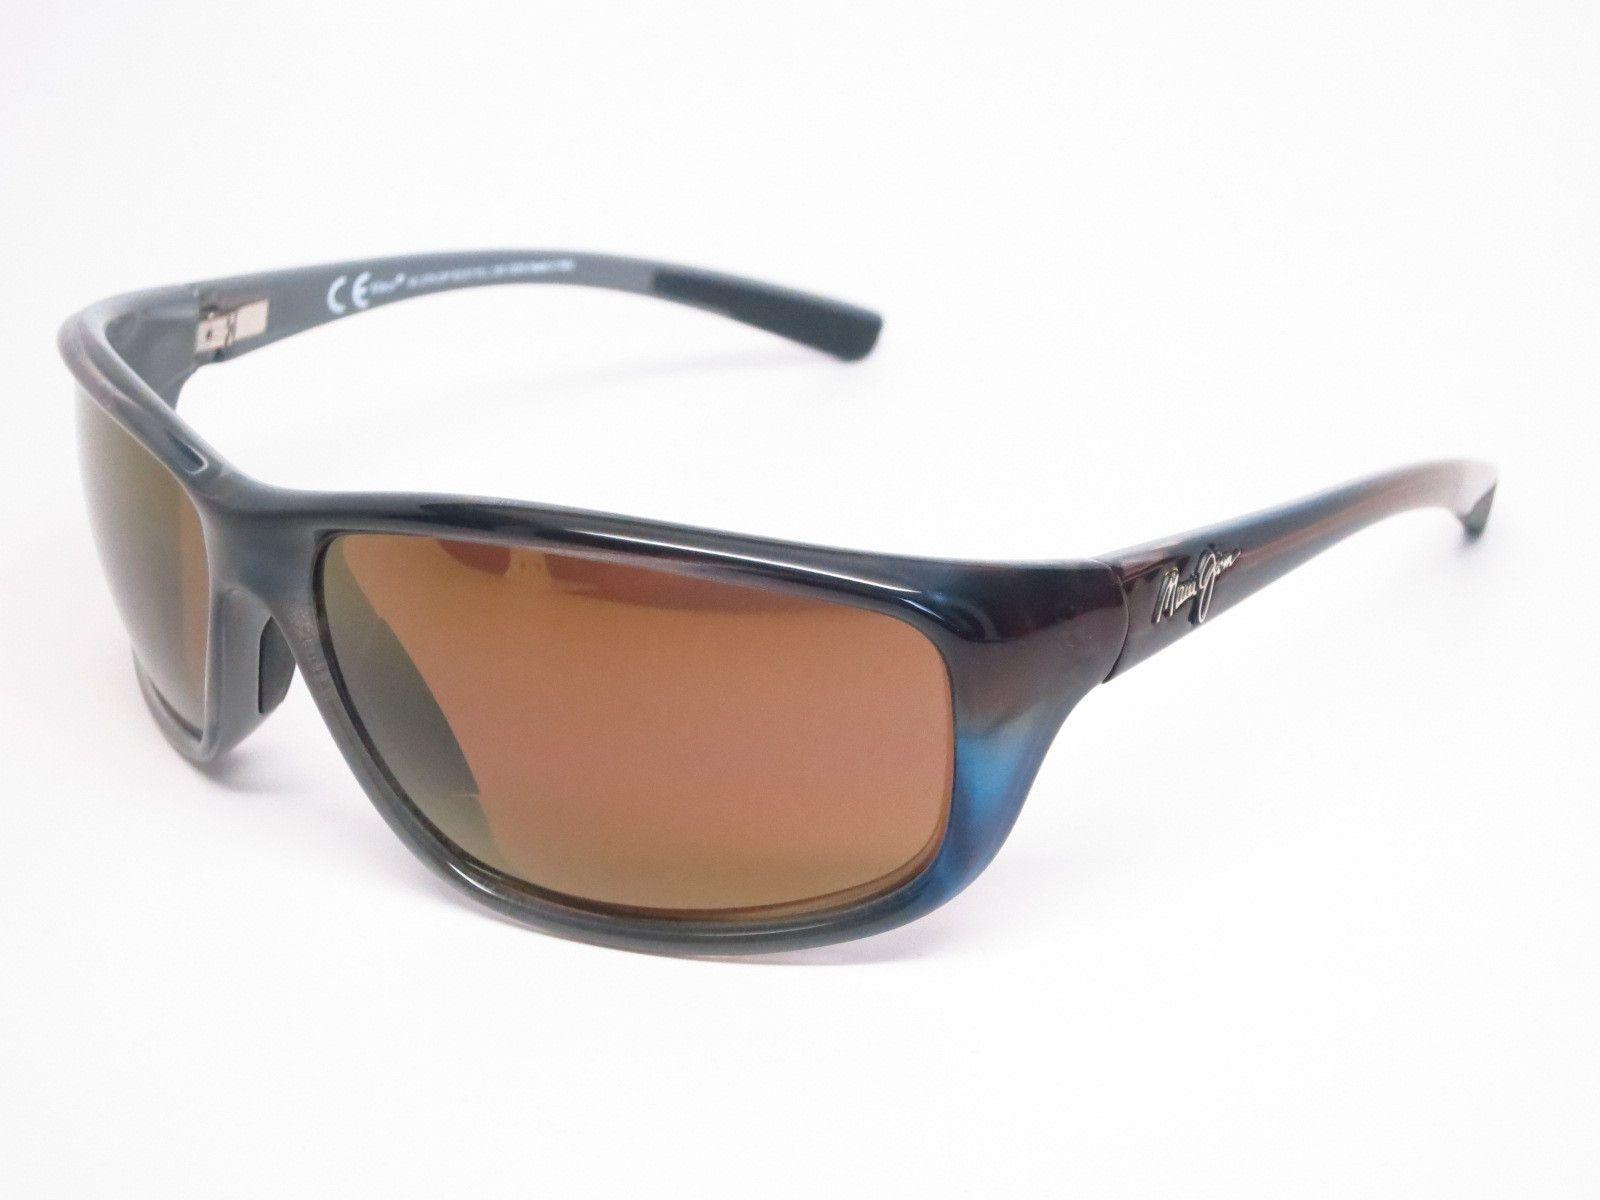 ea064ef89f8b Maui Jim Spartan Reef MJ H278-03F Marlin Polarized Sunglasses ...